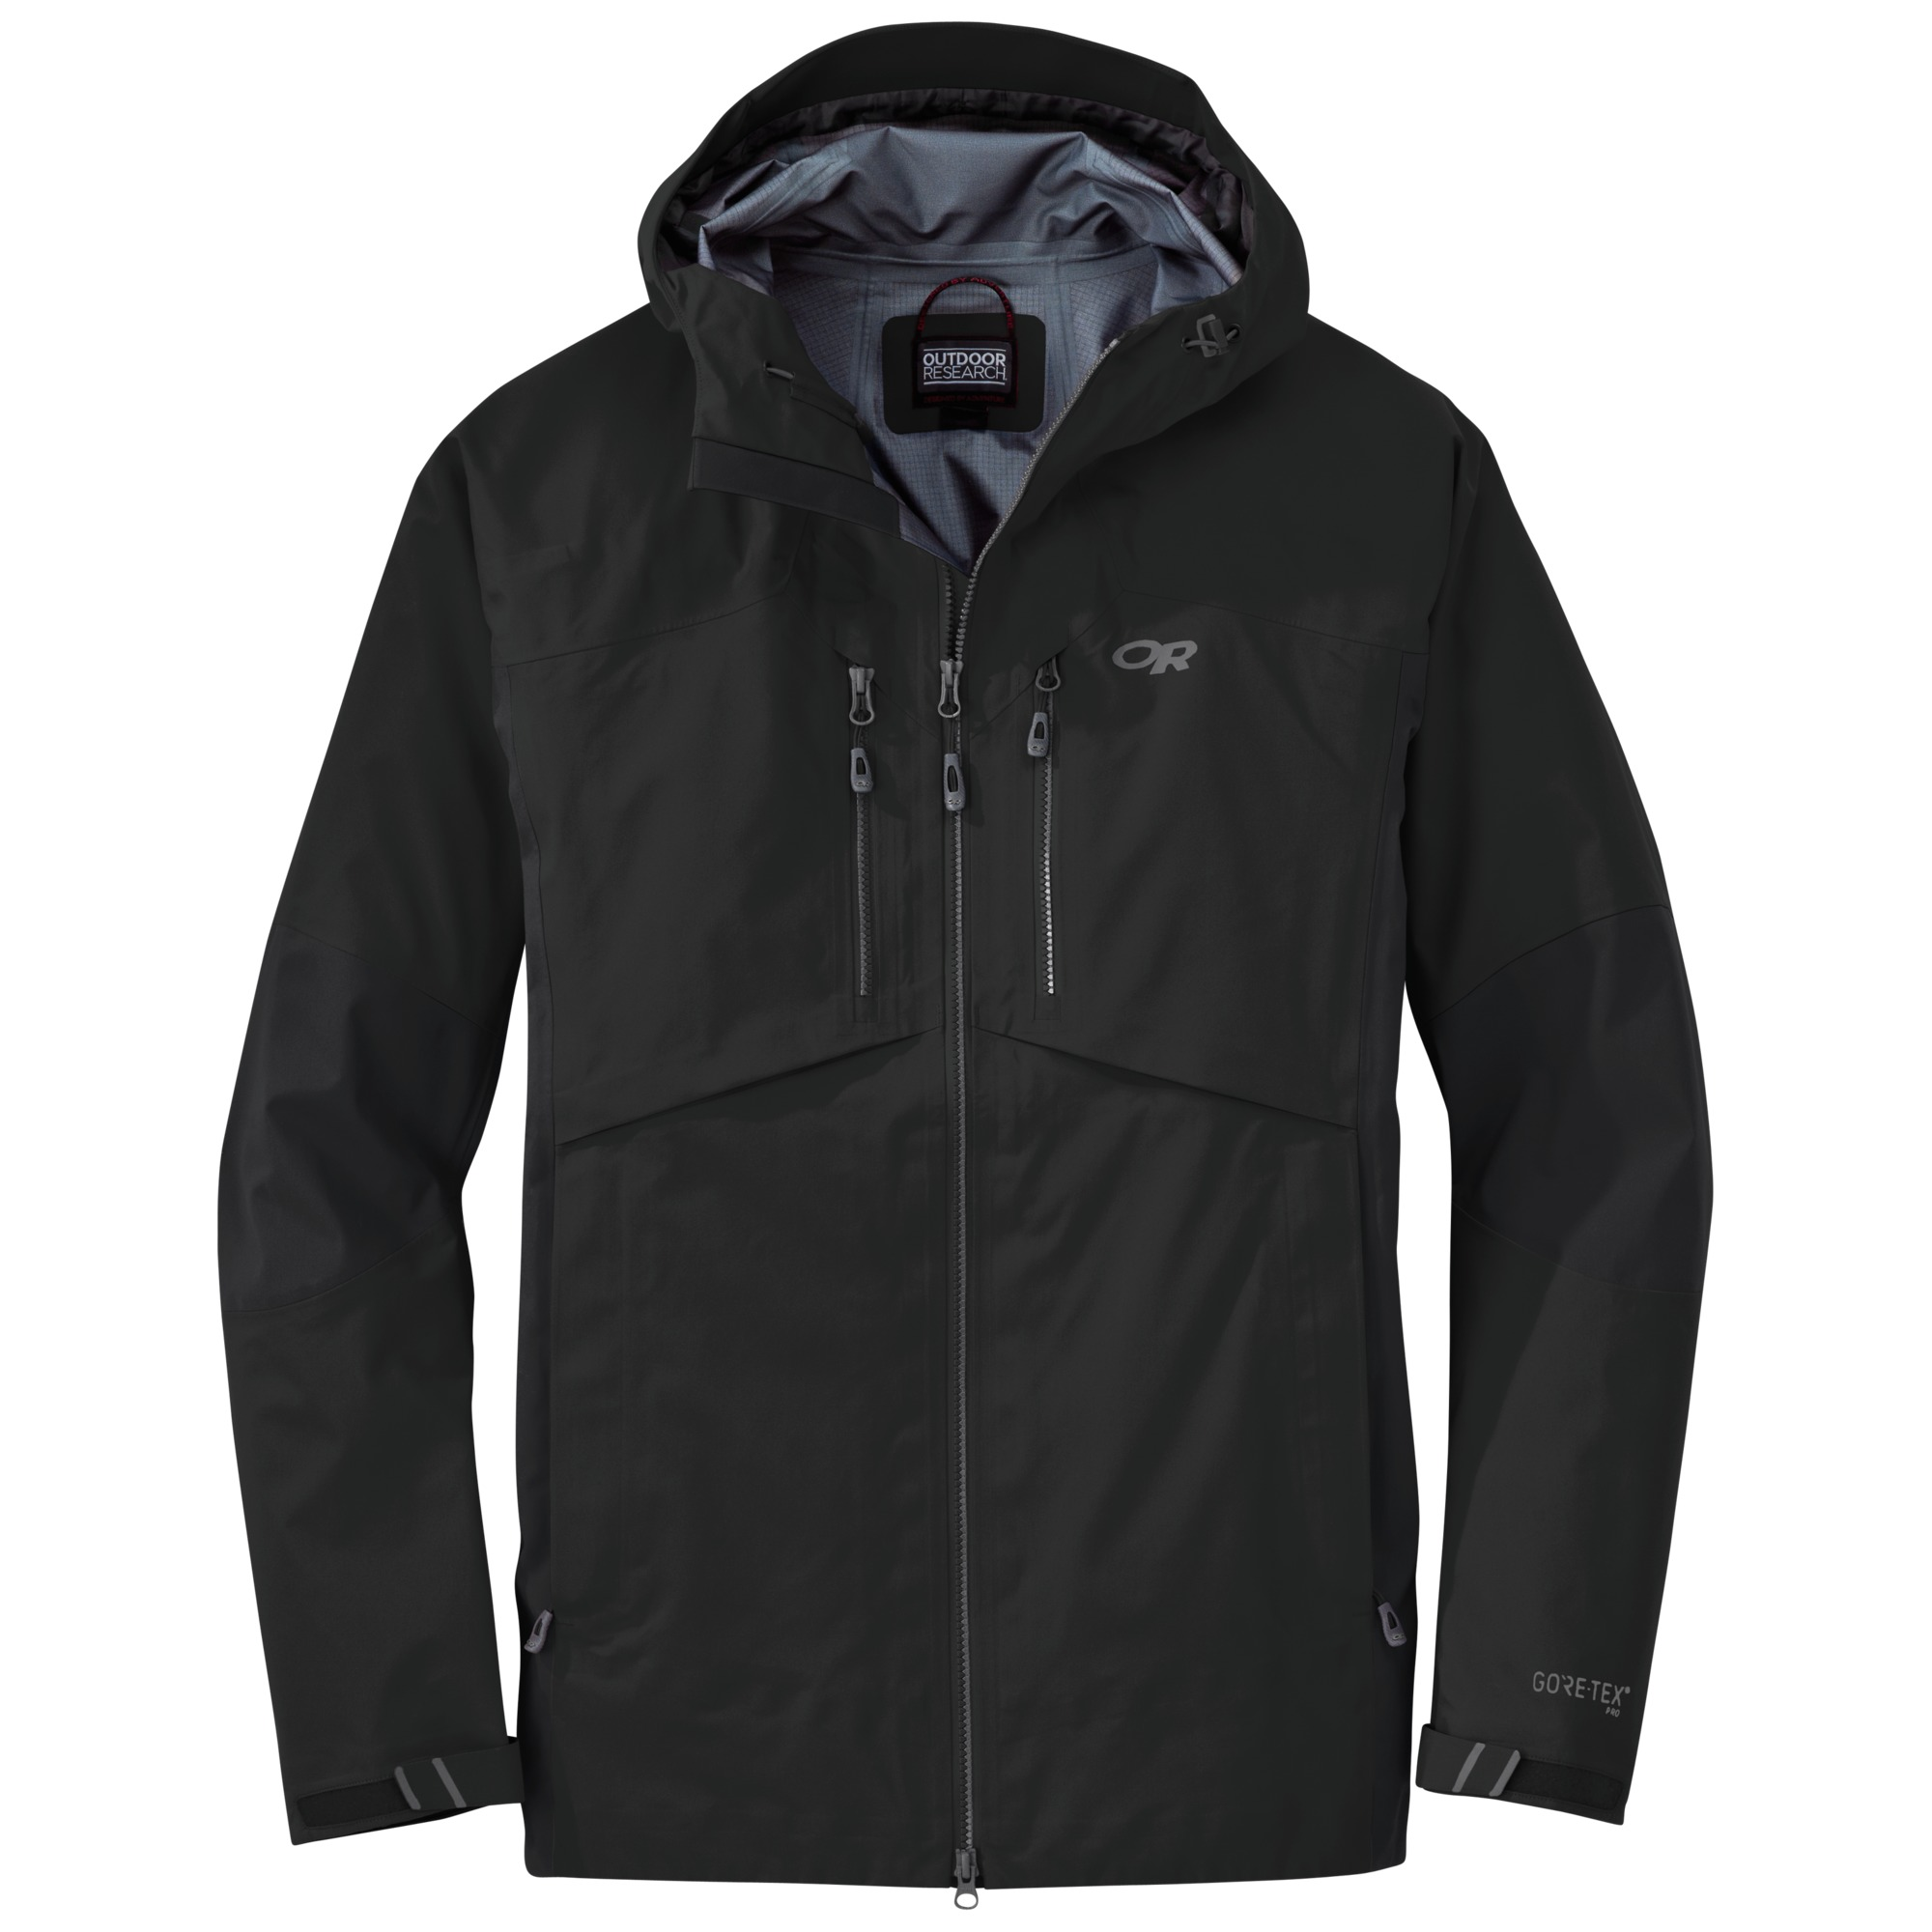 Outdoor Research Men's Maximus Jacket-black-XL - Gr. XL